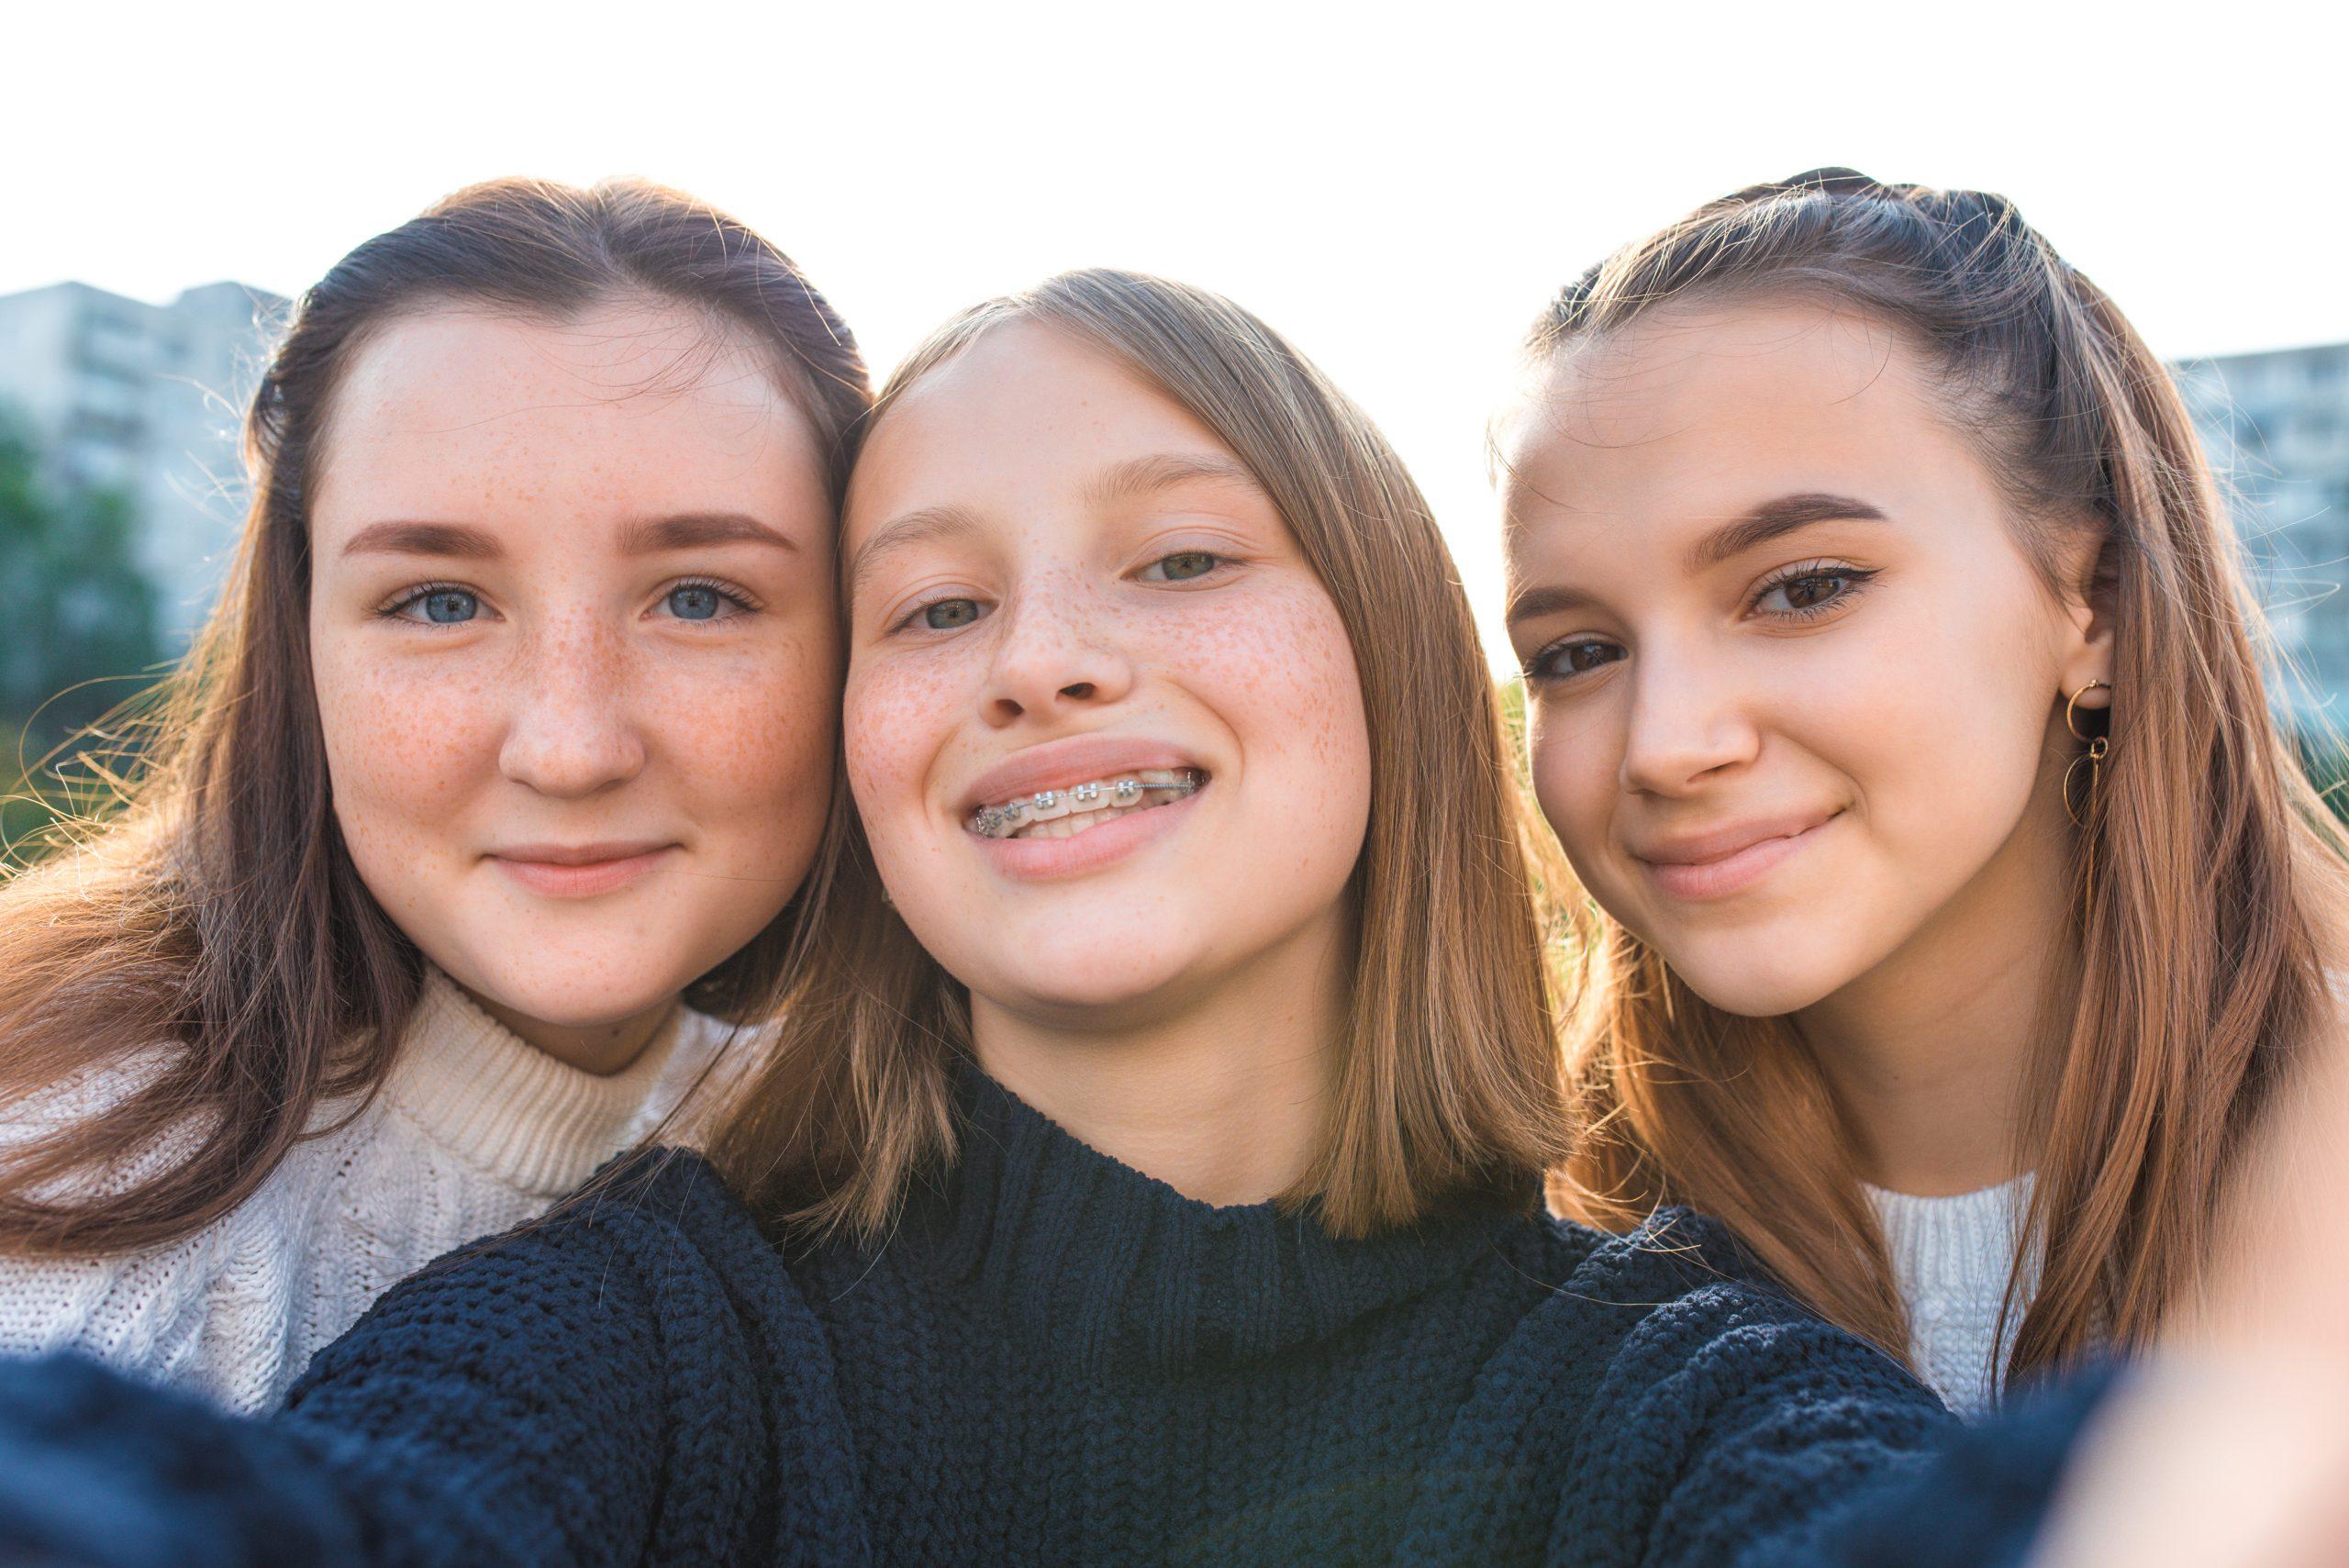 Adolescent Orthodontics in McAllen, TX